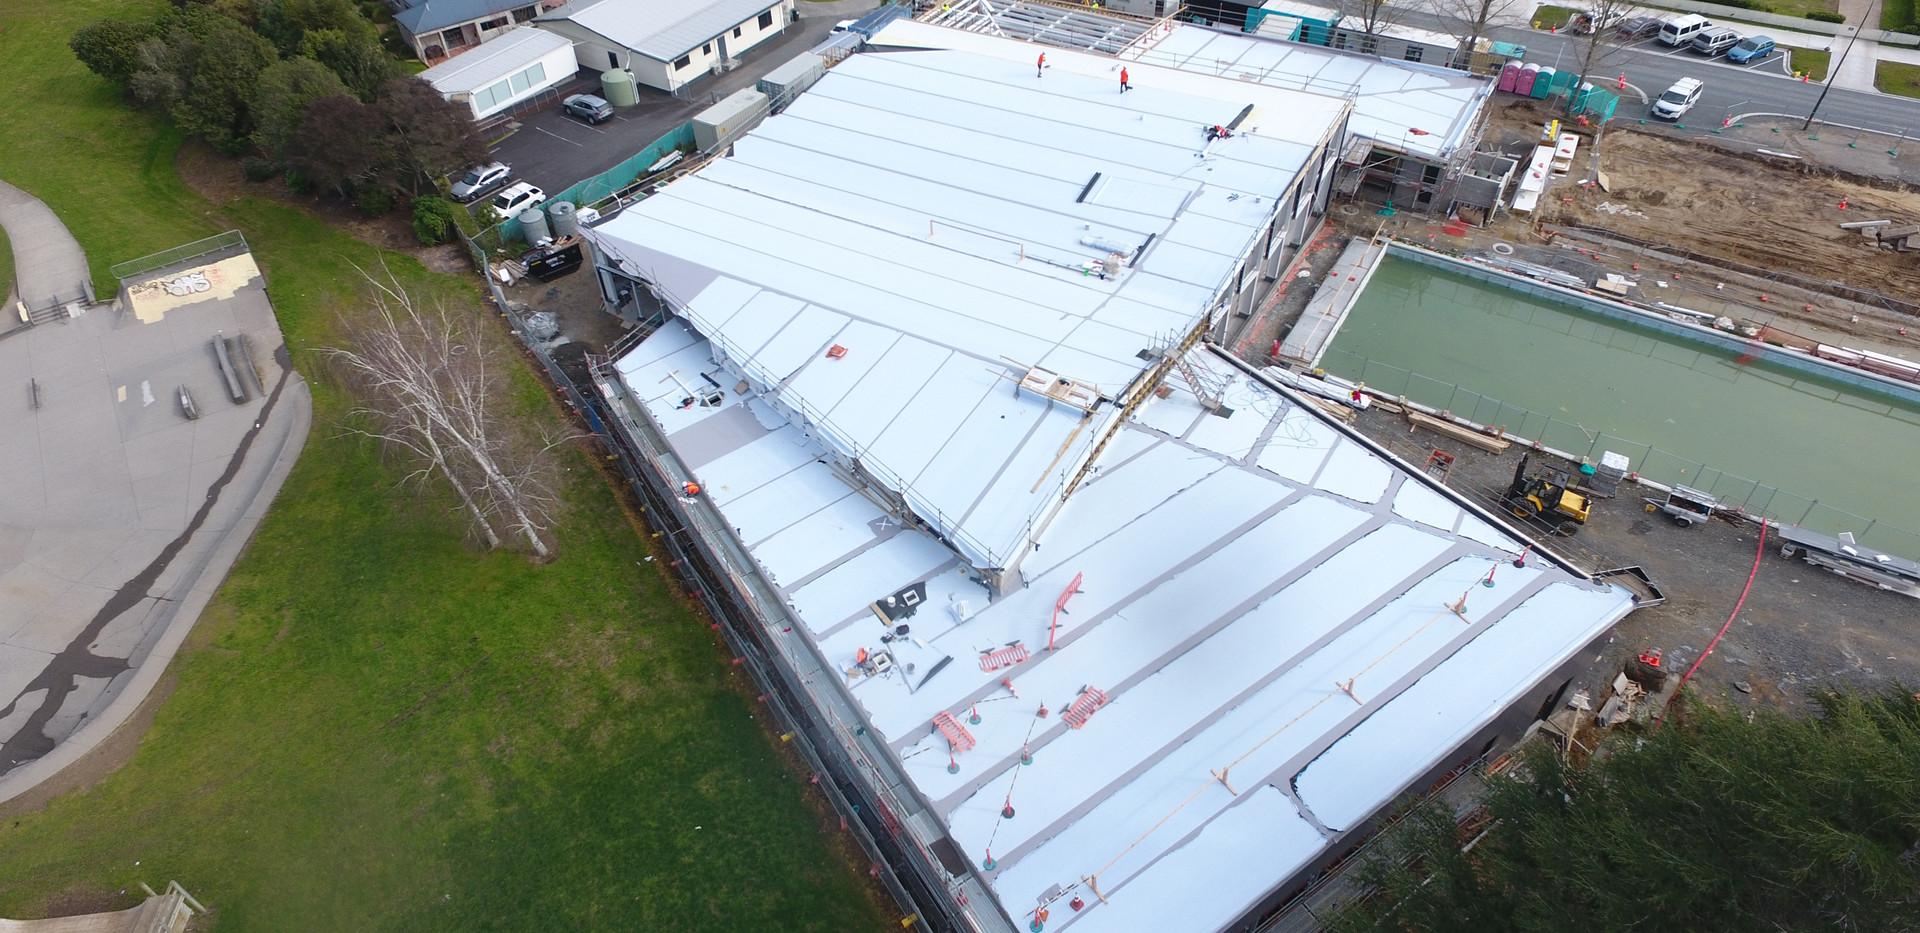 Cambridge Pool Kingspan Warm Roof. TPO Enviroclad Membrane Overlay. Evo Panel Architectural Wall Panels 4